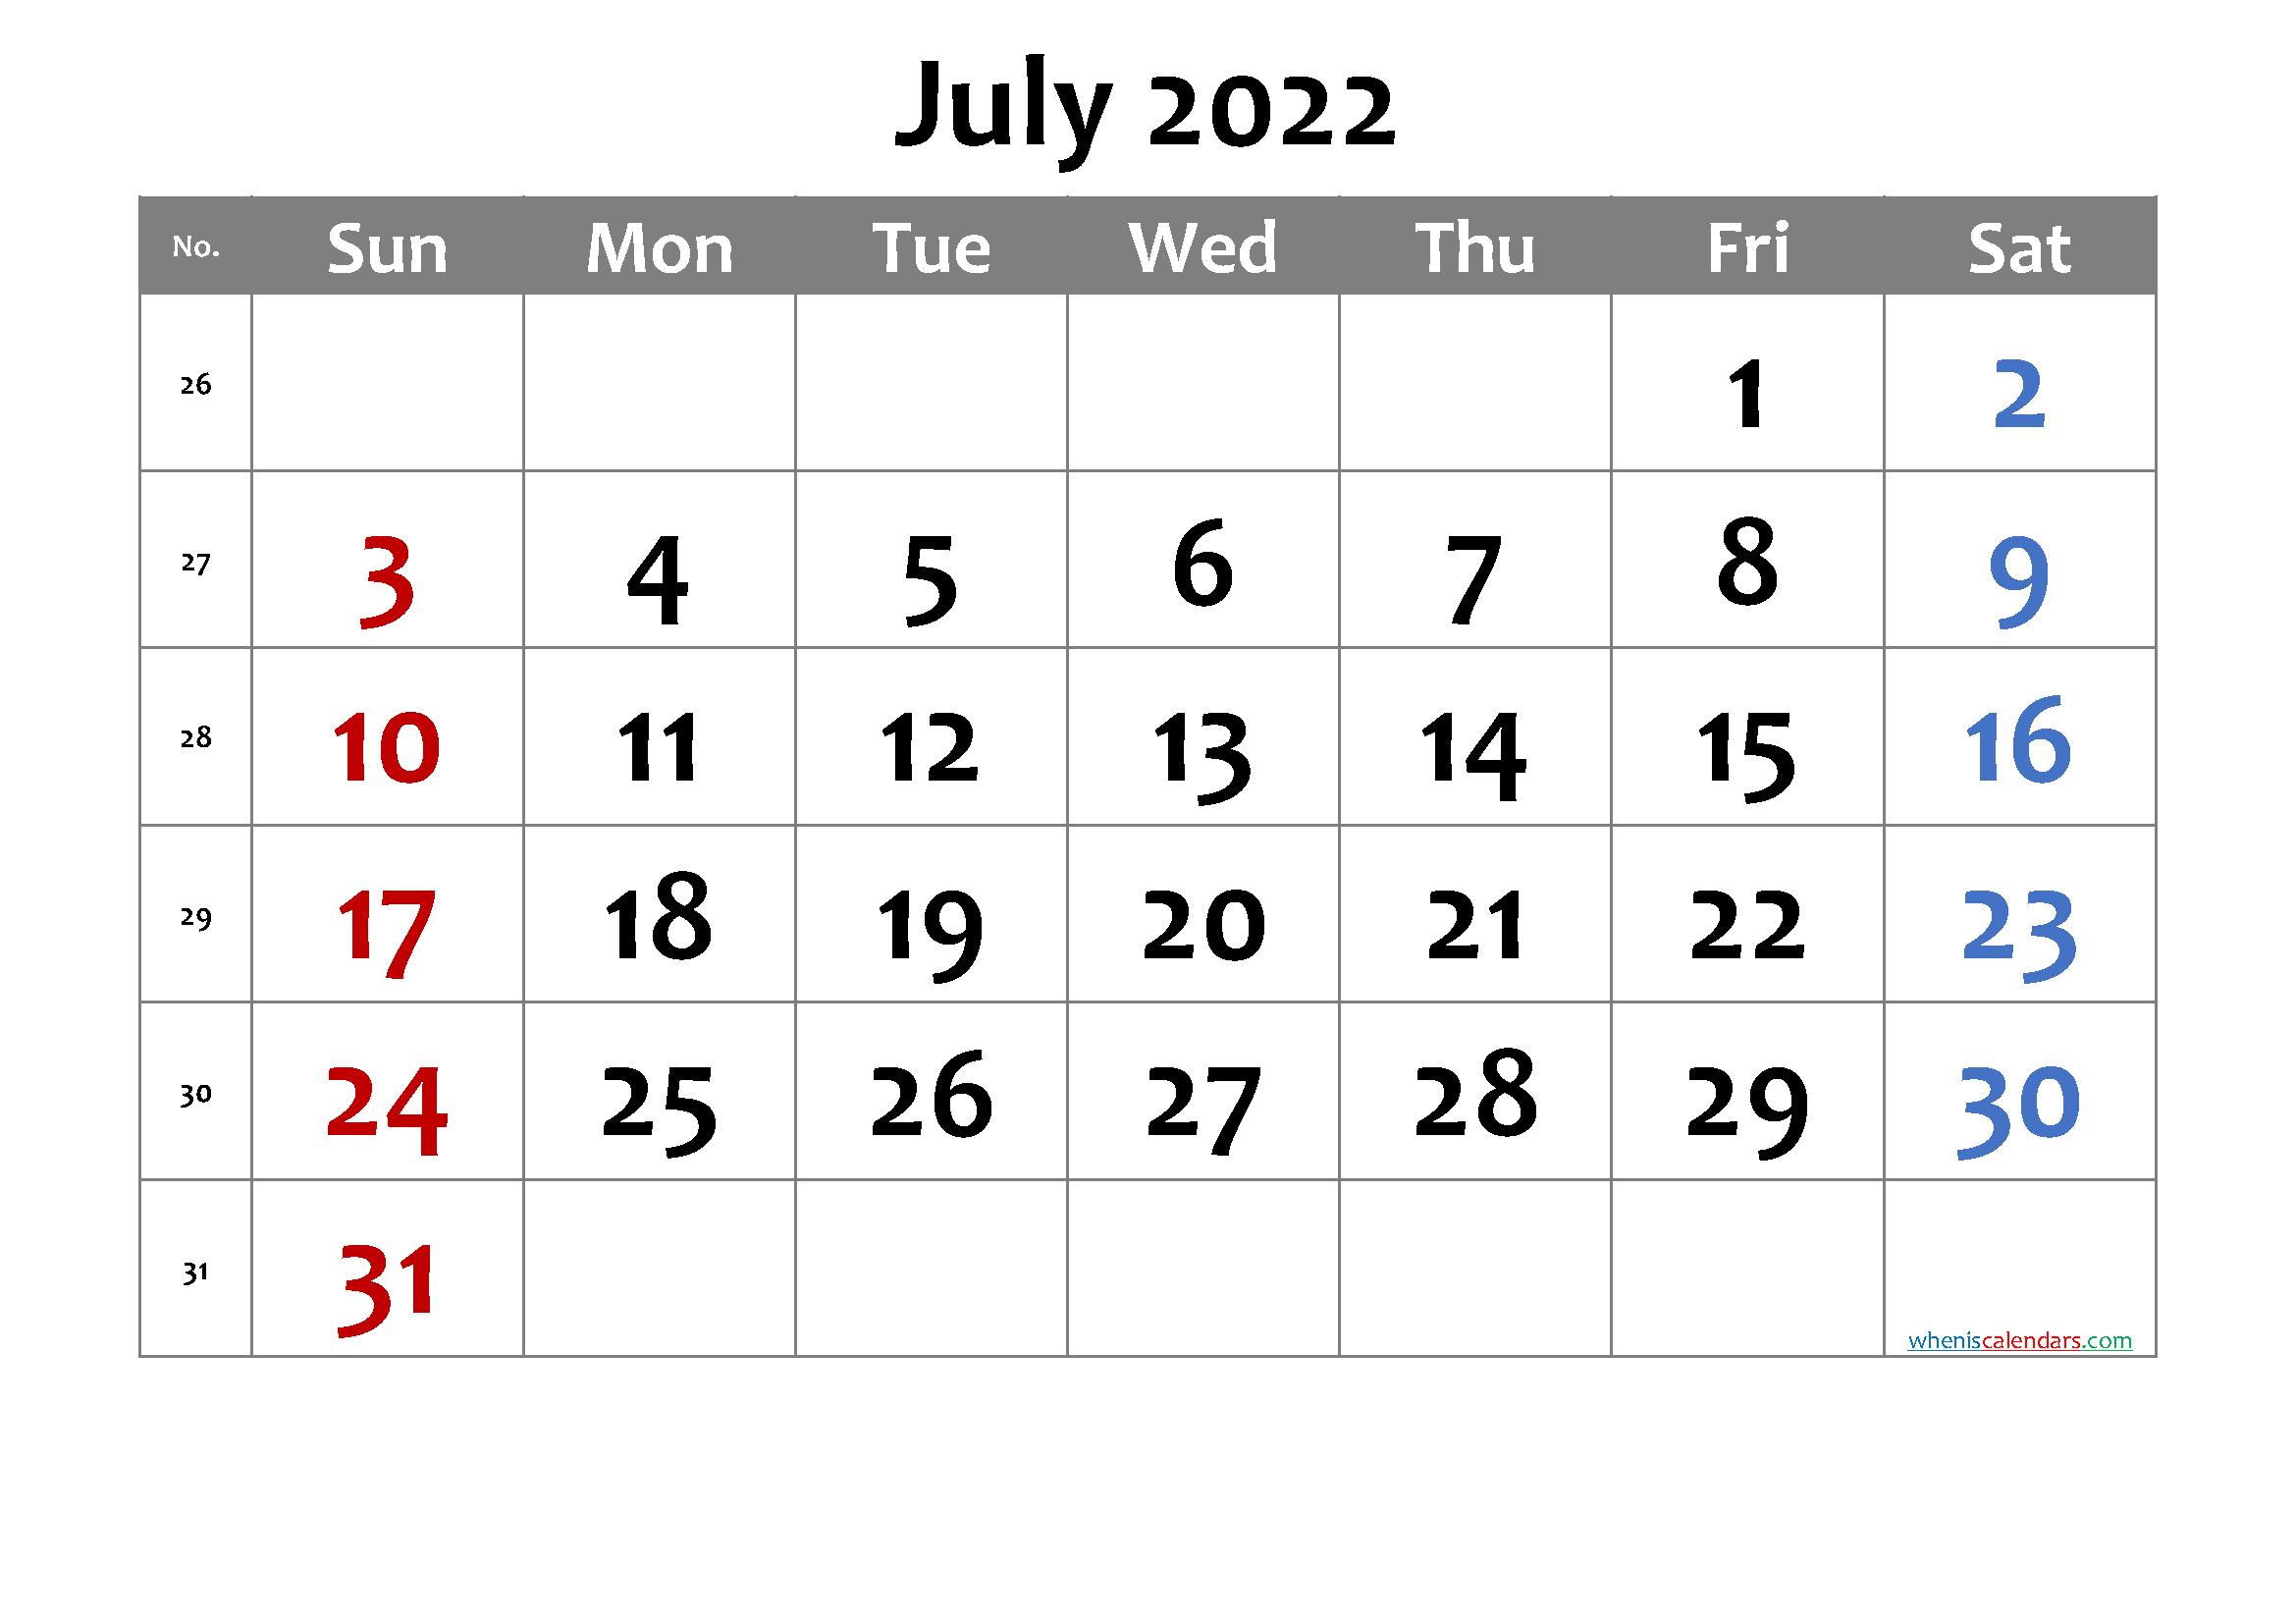 Free Printable July 2022 Calendar With Week Numbers with regard to Blank Calendar Template July 2022